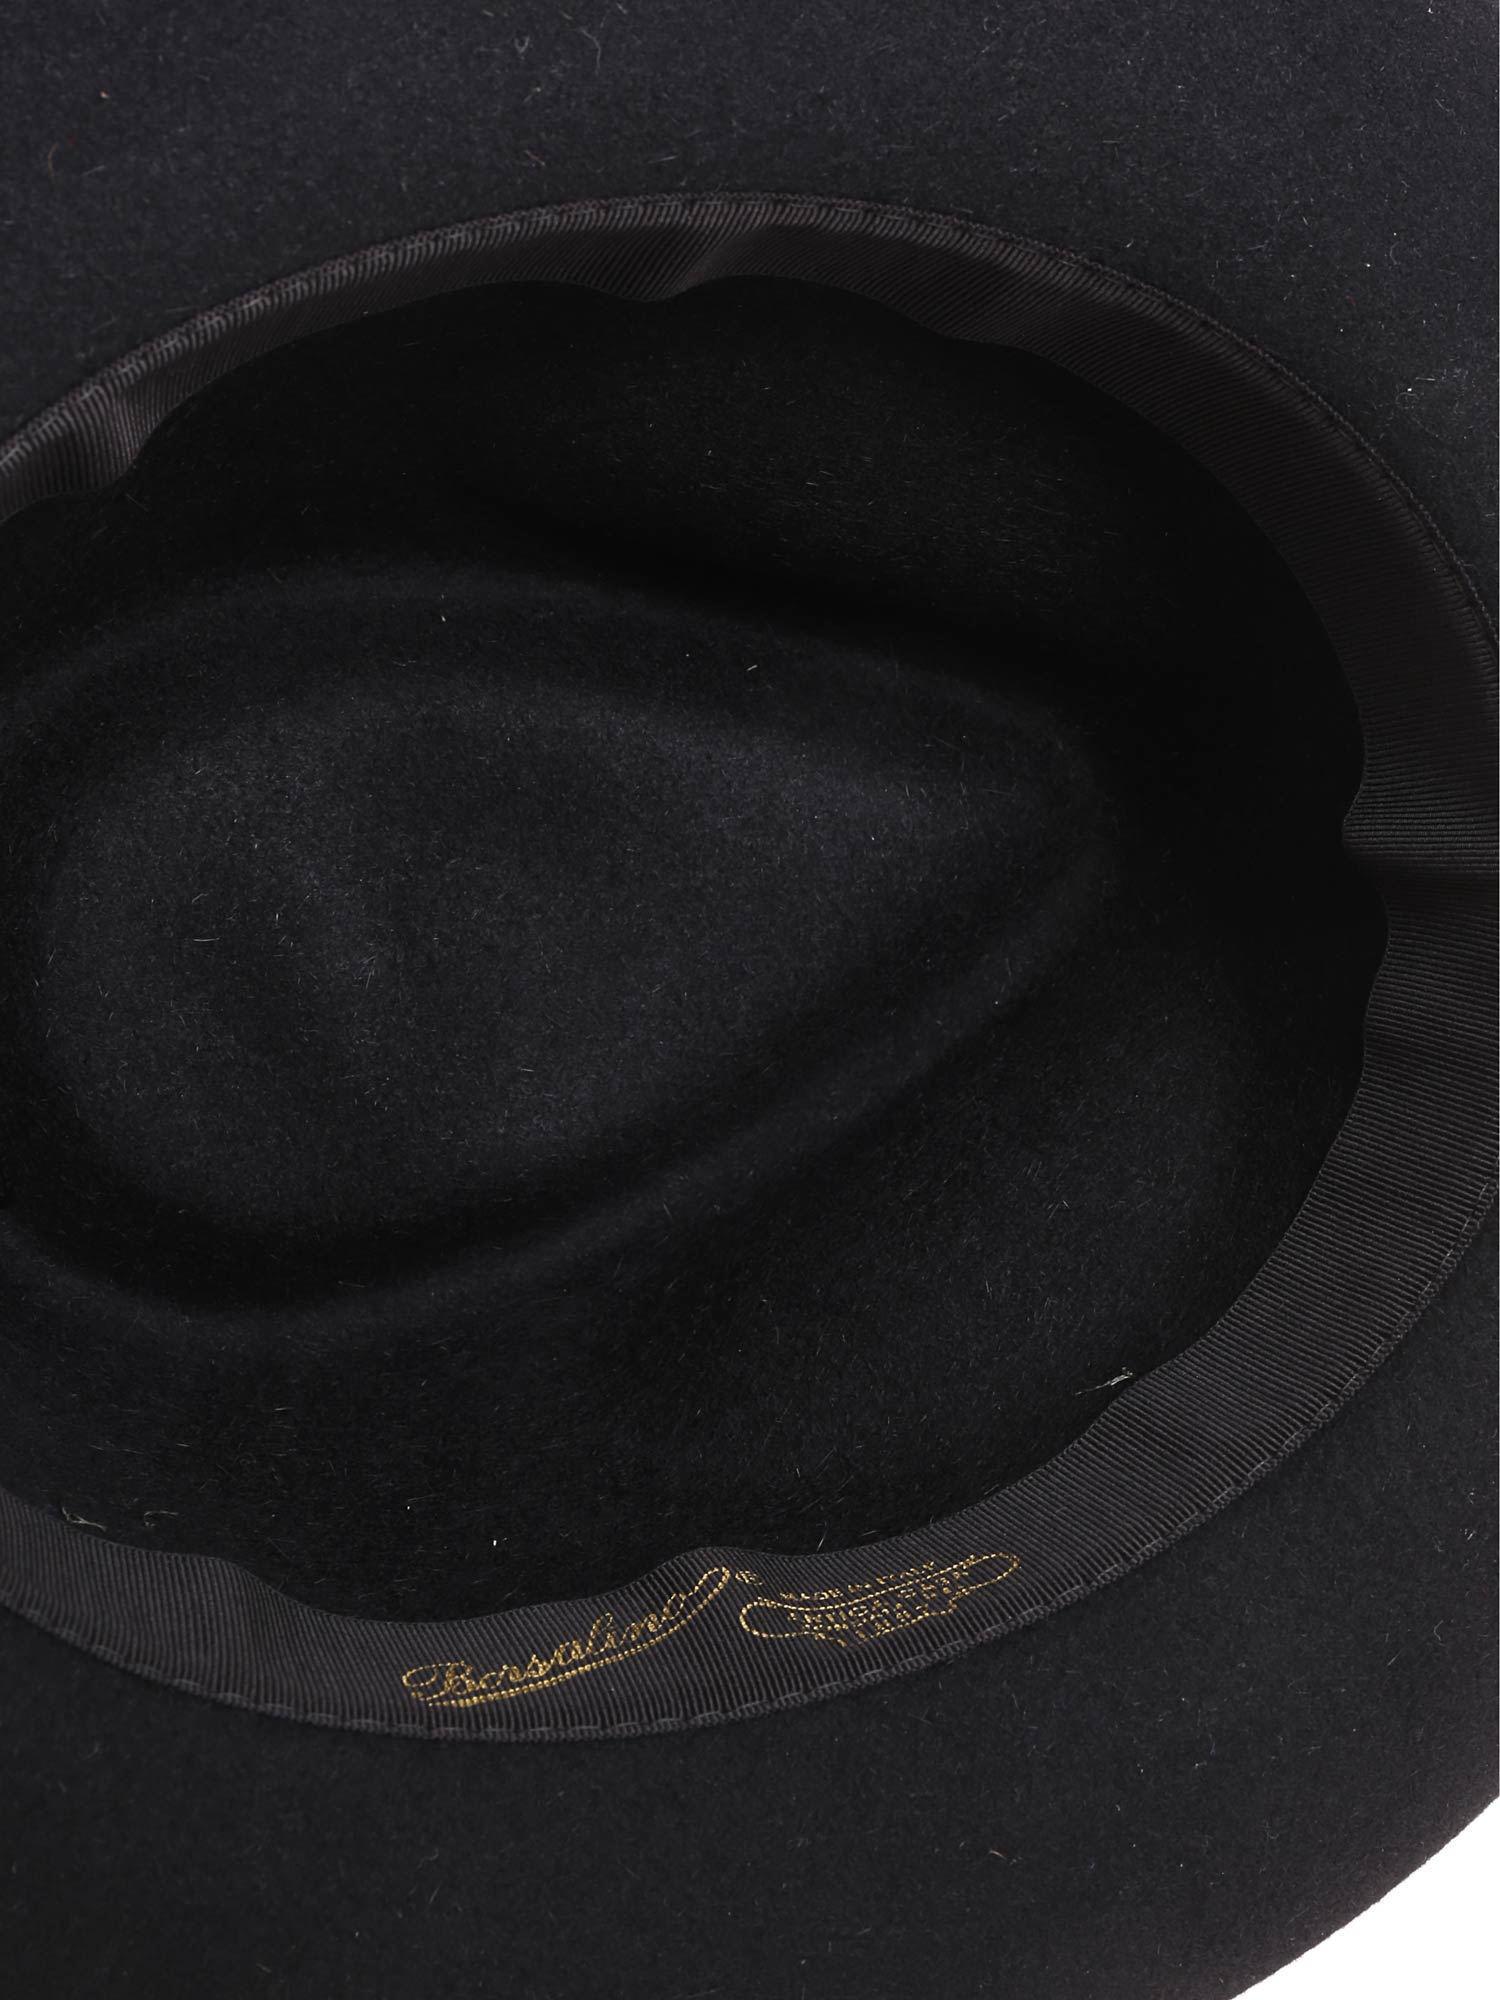 d3b25c6d04780b Borsalino - Rasato Black Hat With Green Insert for Men - Lyst. View  fullscreen